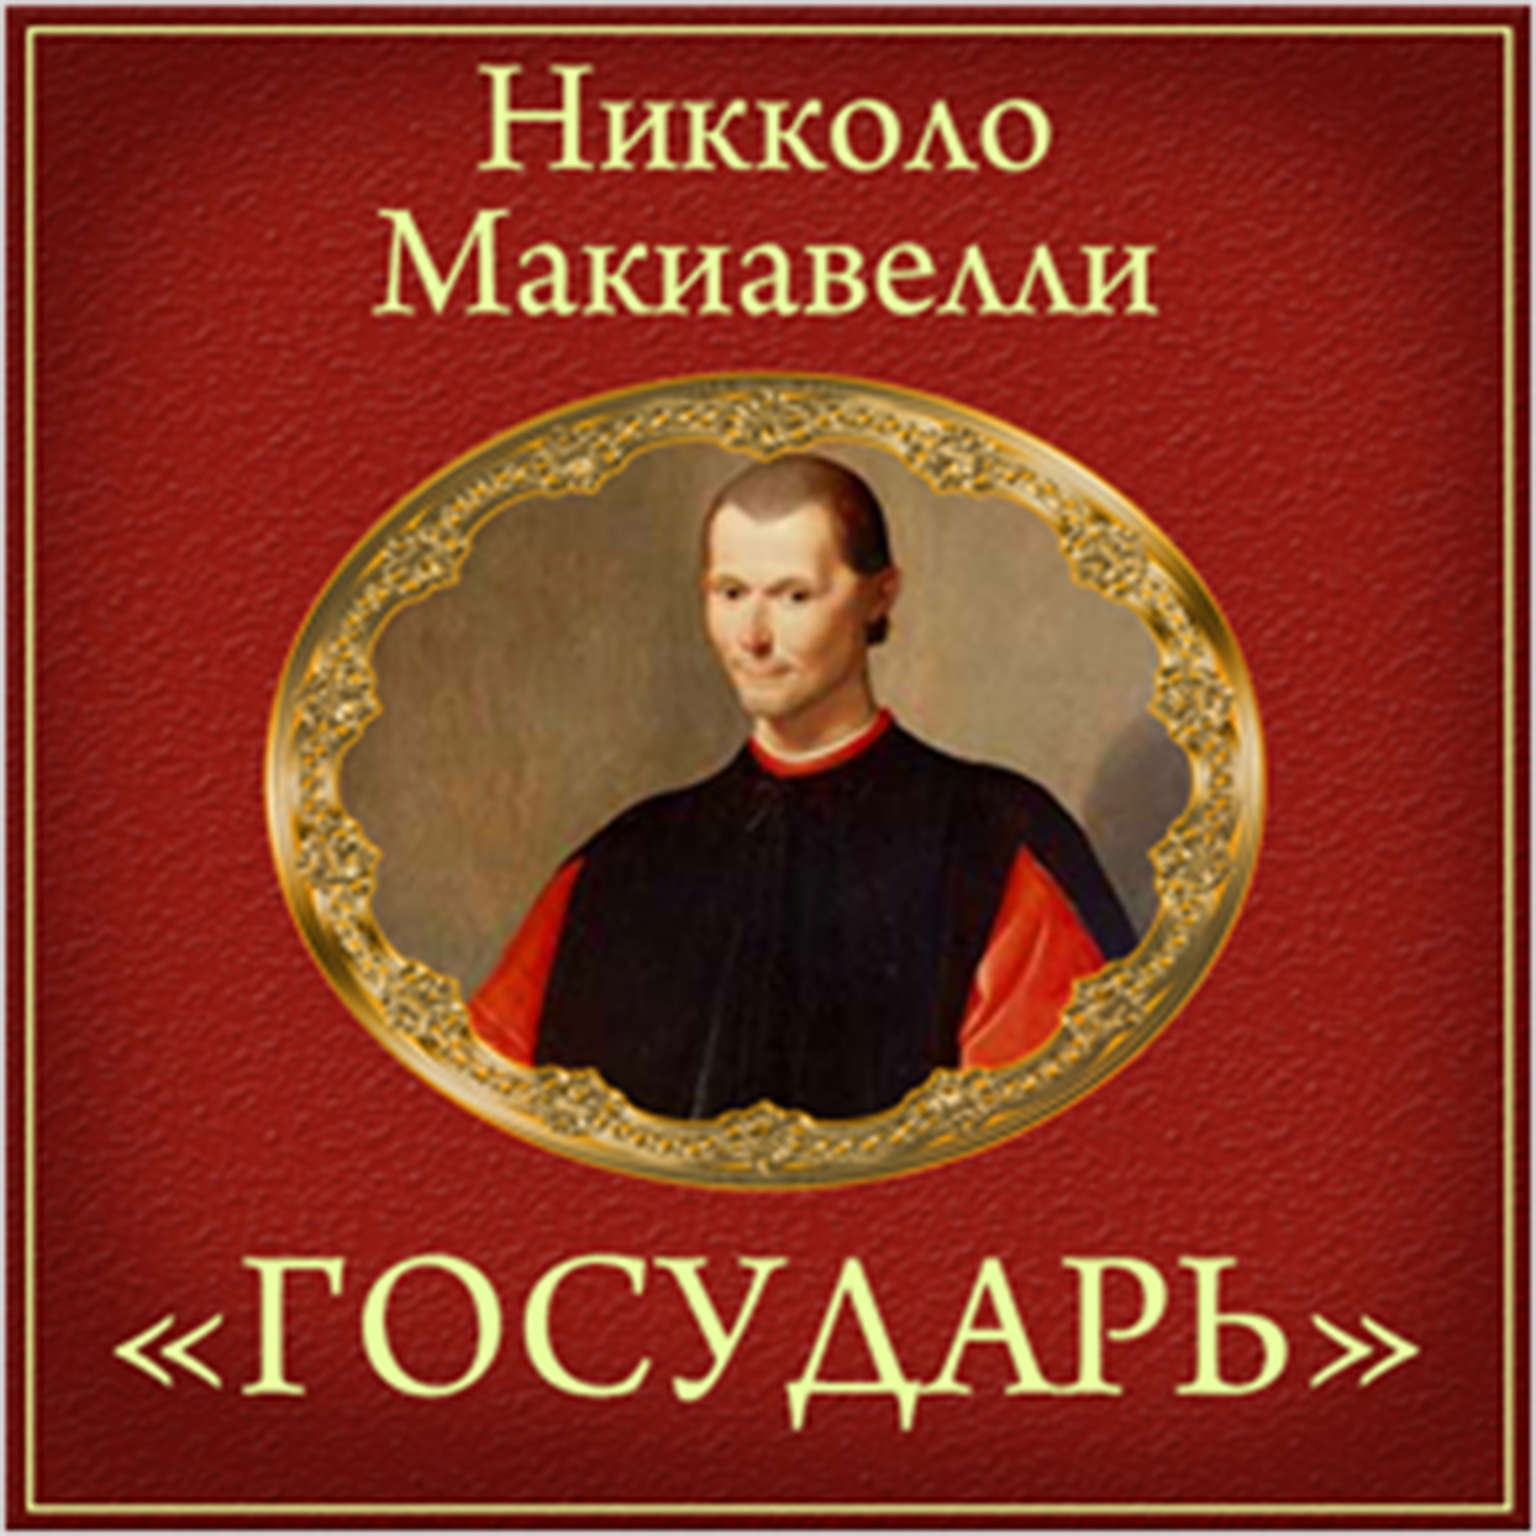 Prince. Summary [Russian Edition] Audiobook, by Niccolò Machiavelli